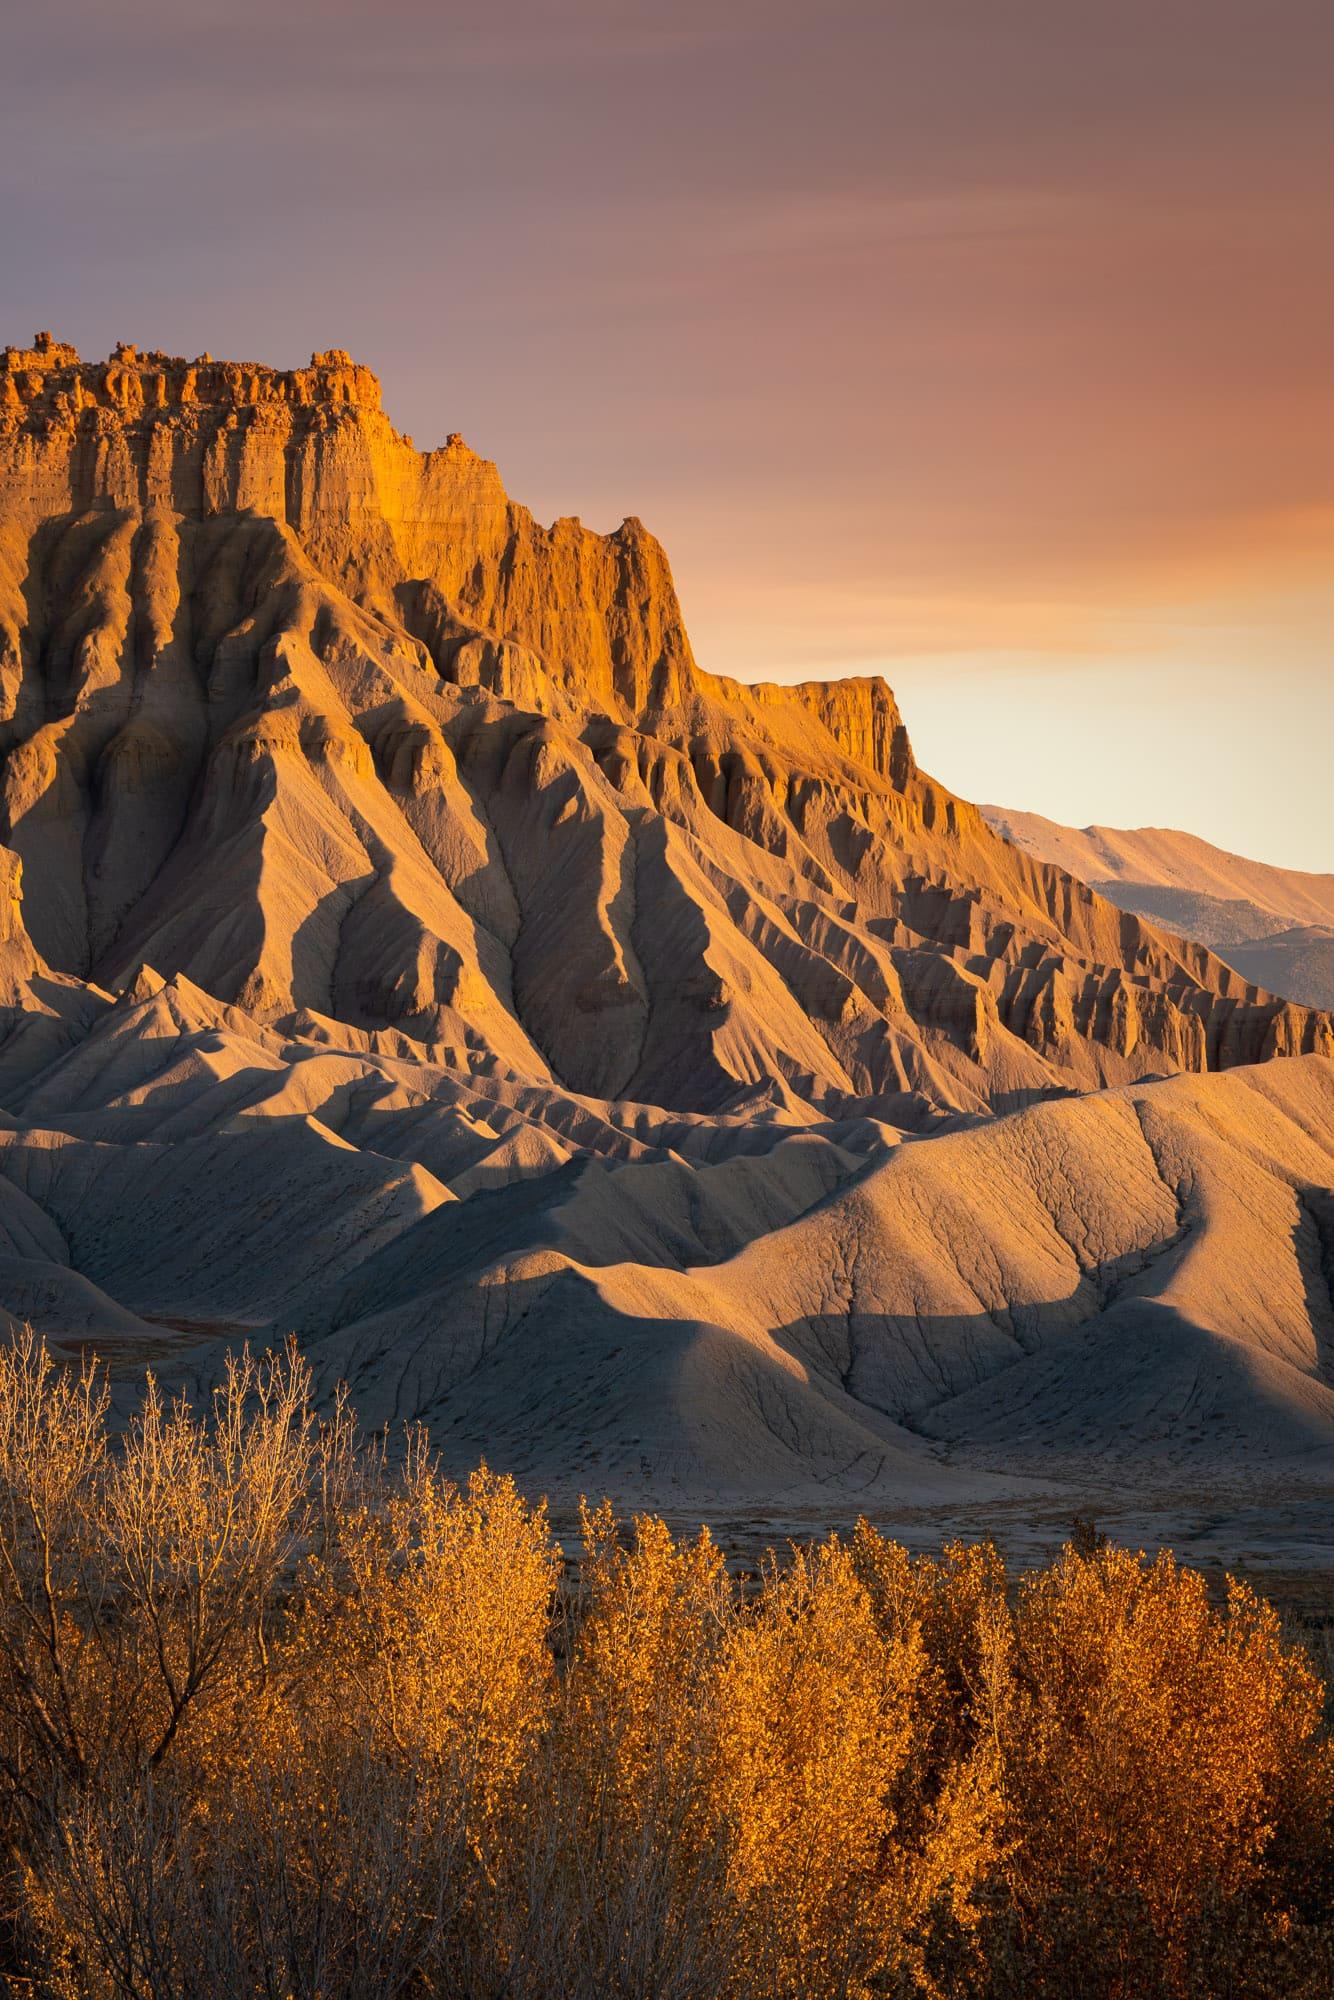 Caineville Mesa at sunset, Utah